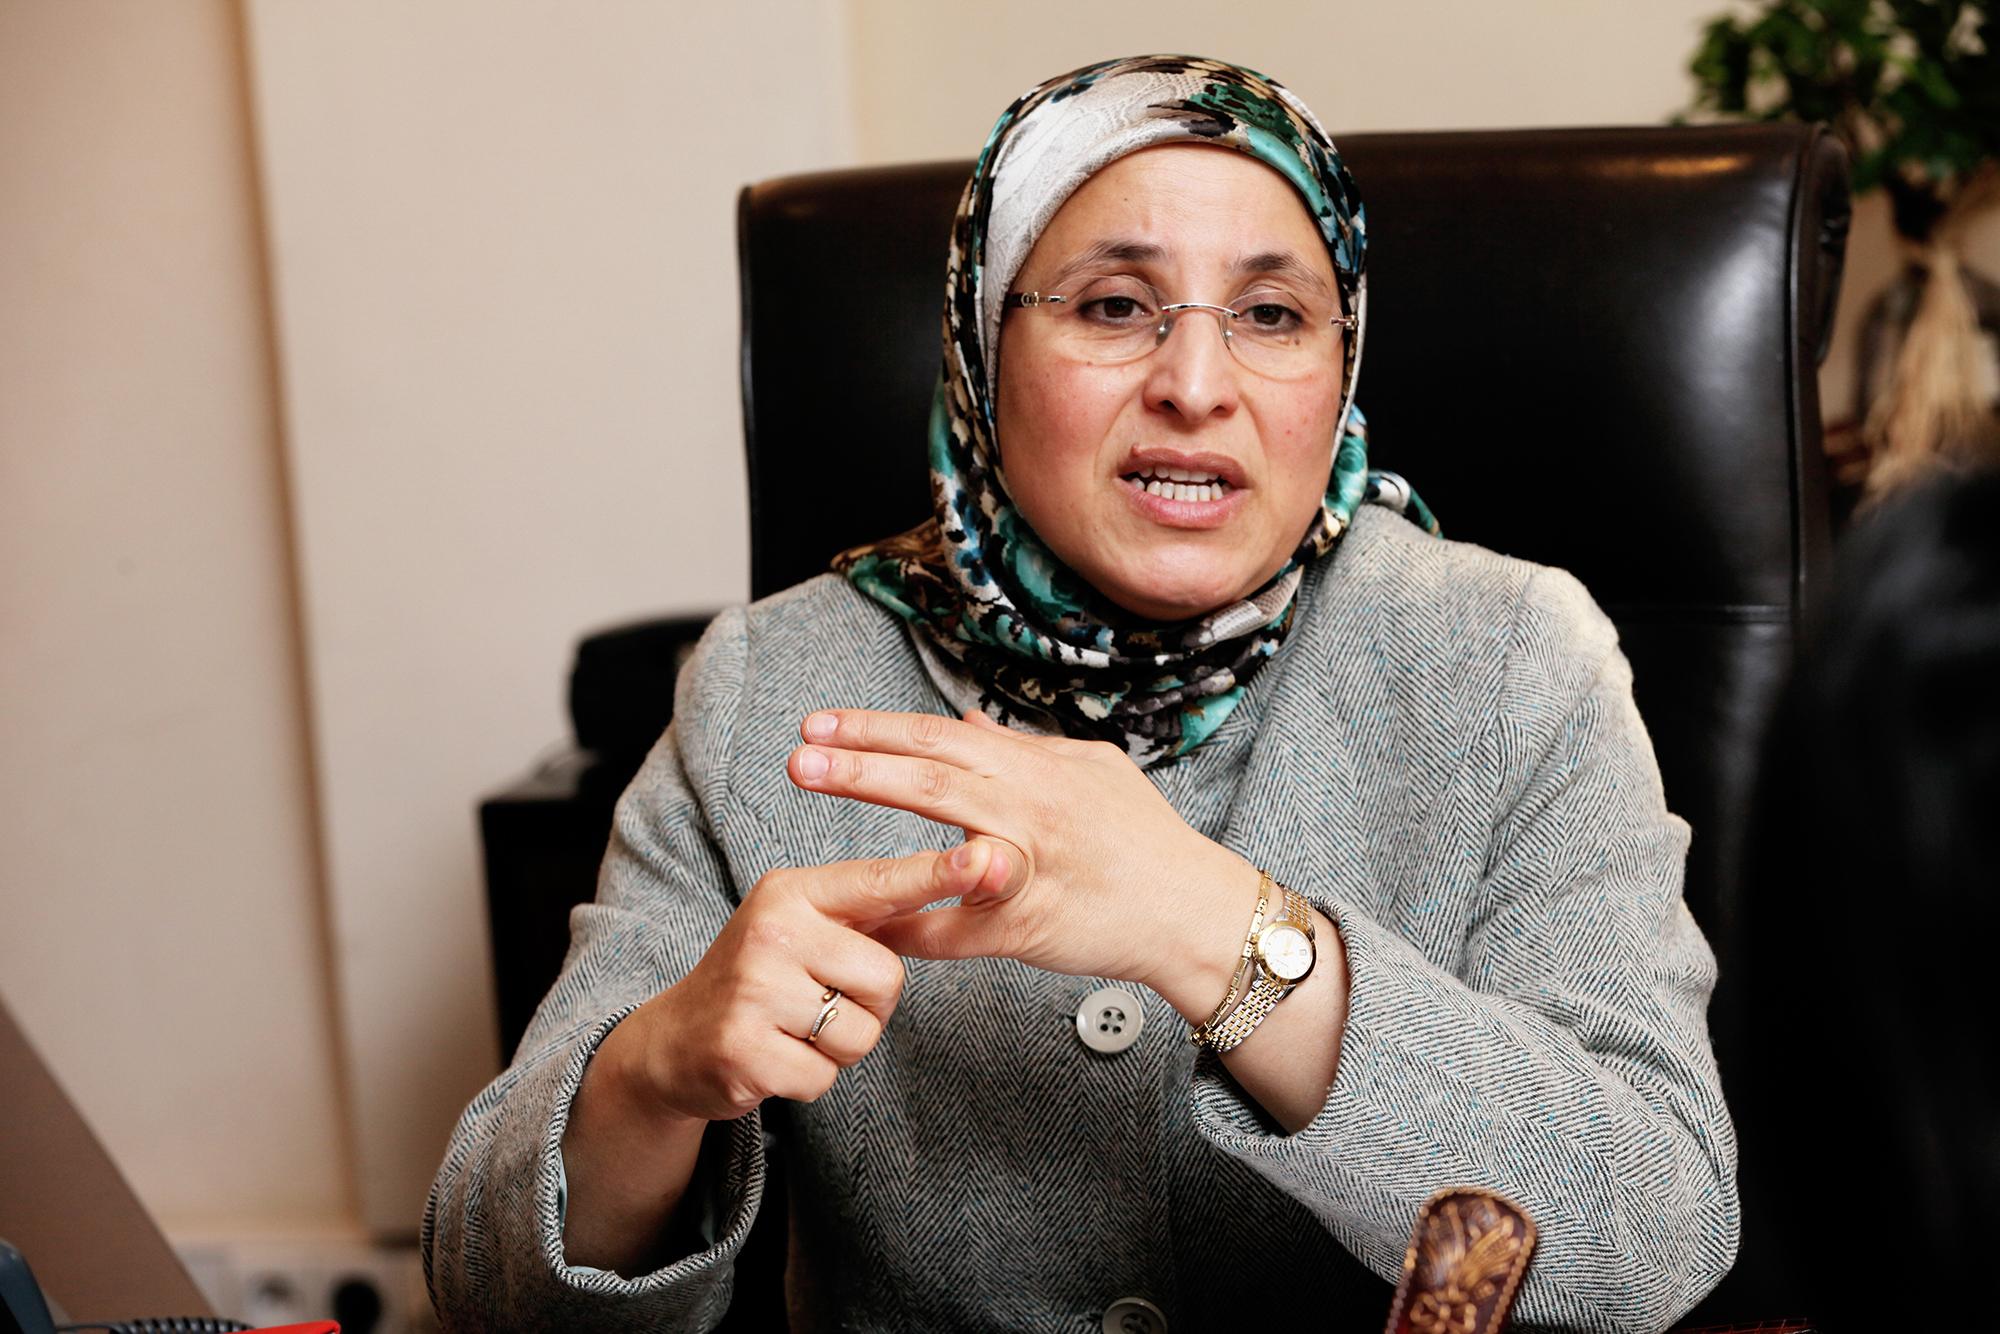 Photo of رسالة من المركز المغربي لحقوق الإنسان إلى الوزيرة المكلفة بالأسرة و التضامن و المساواة و التنمية الاجتماعية